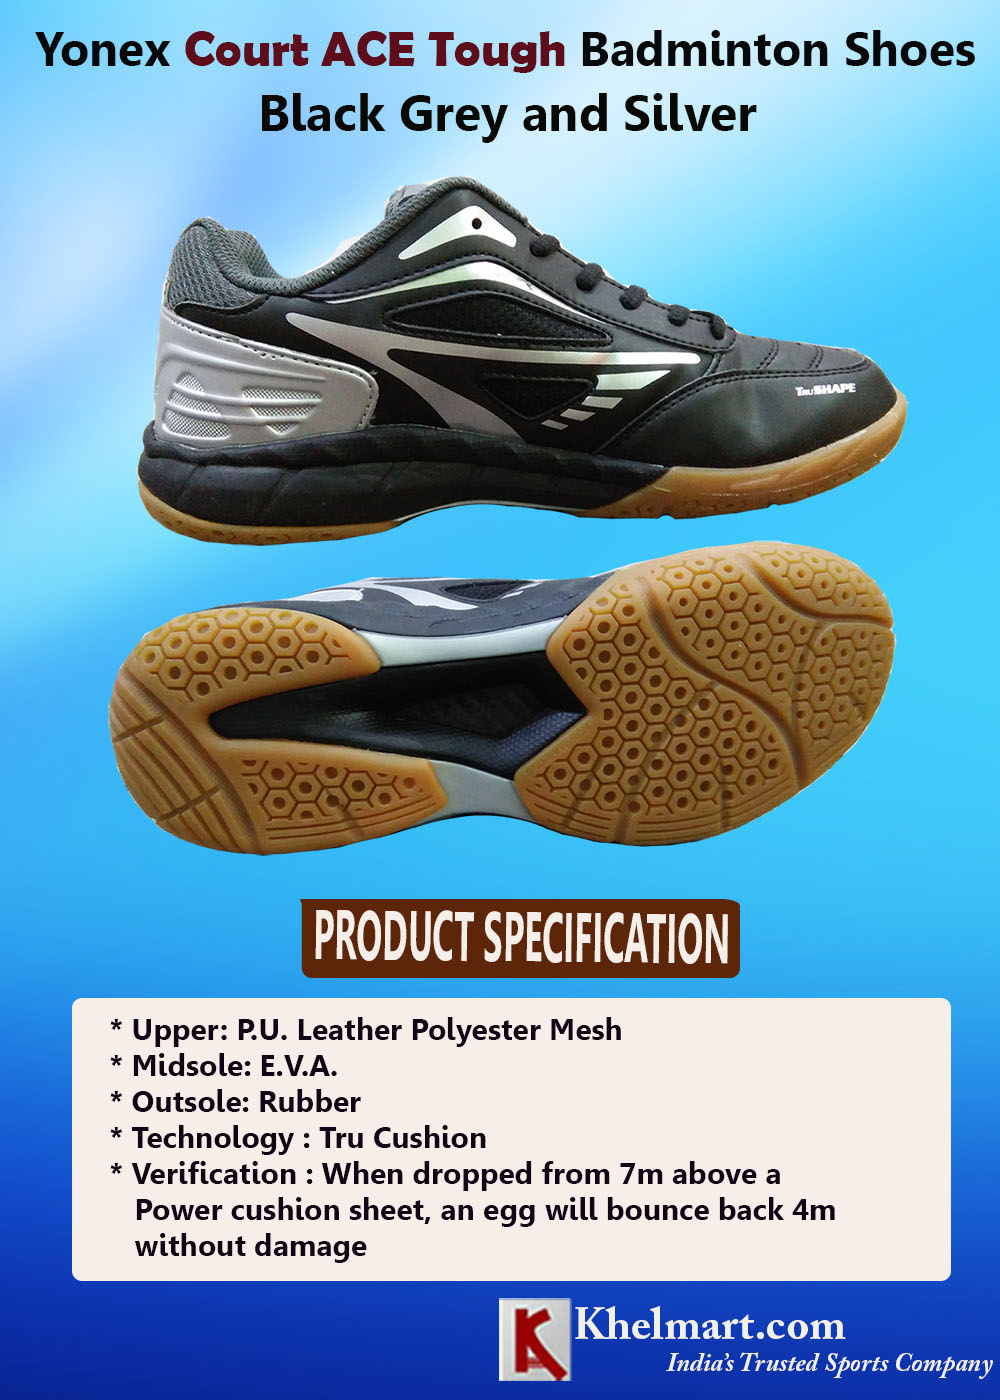 Yonex Court ACE Tough Badminton Shoes Black Grey and Silver_5